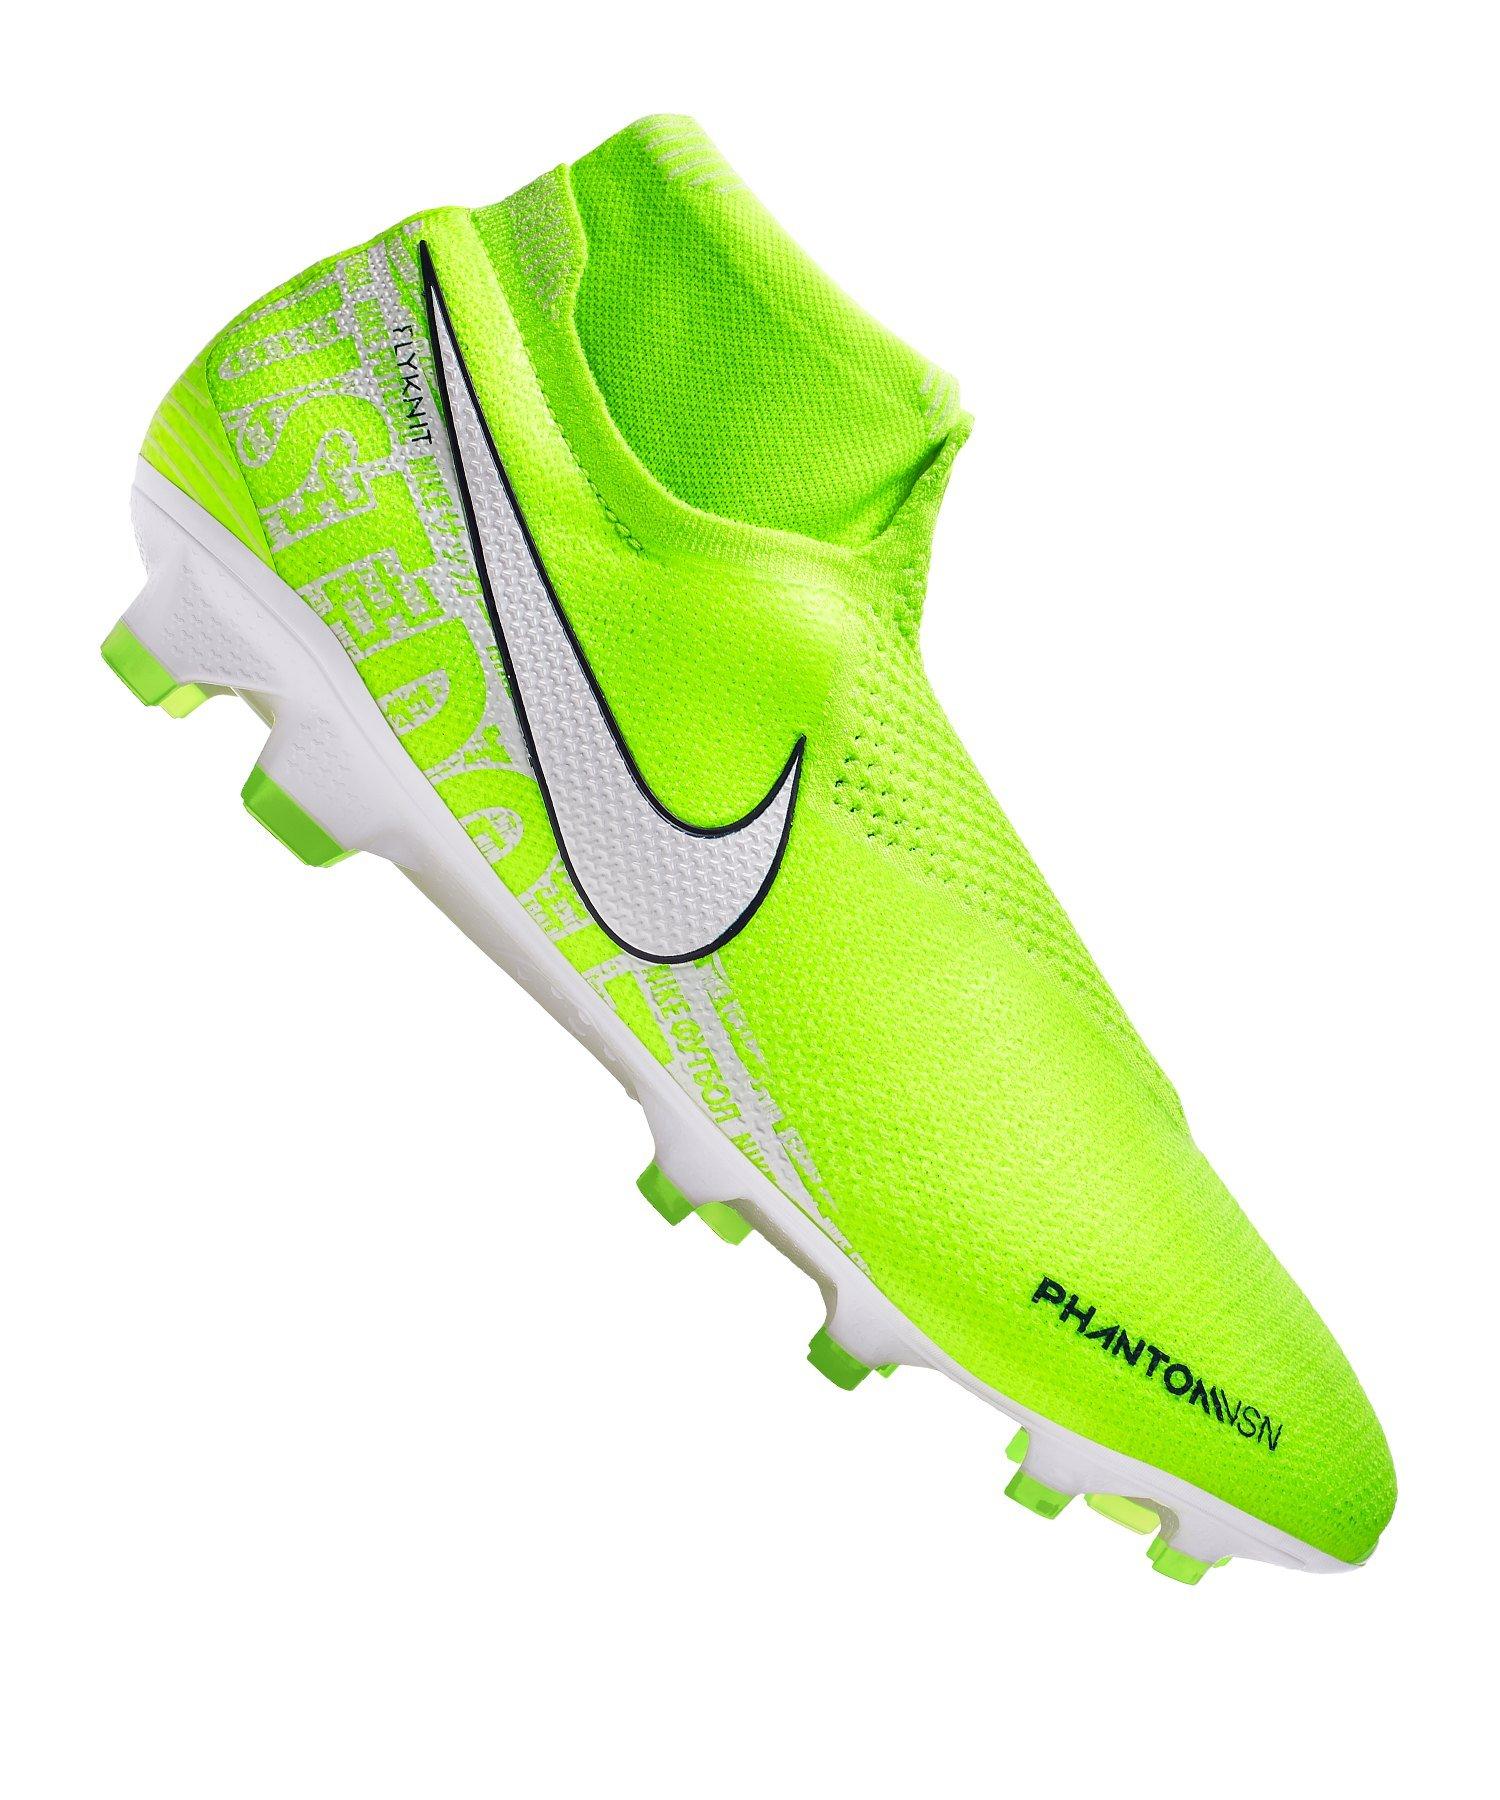 Nike Fussball Schuhe neon gelb gr 41